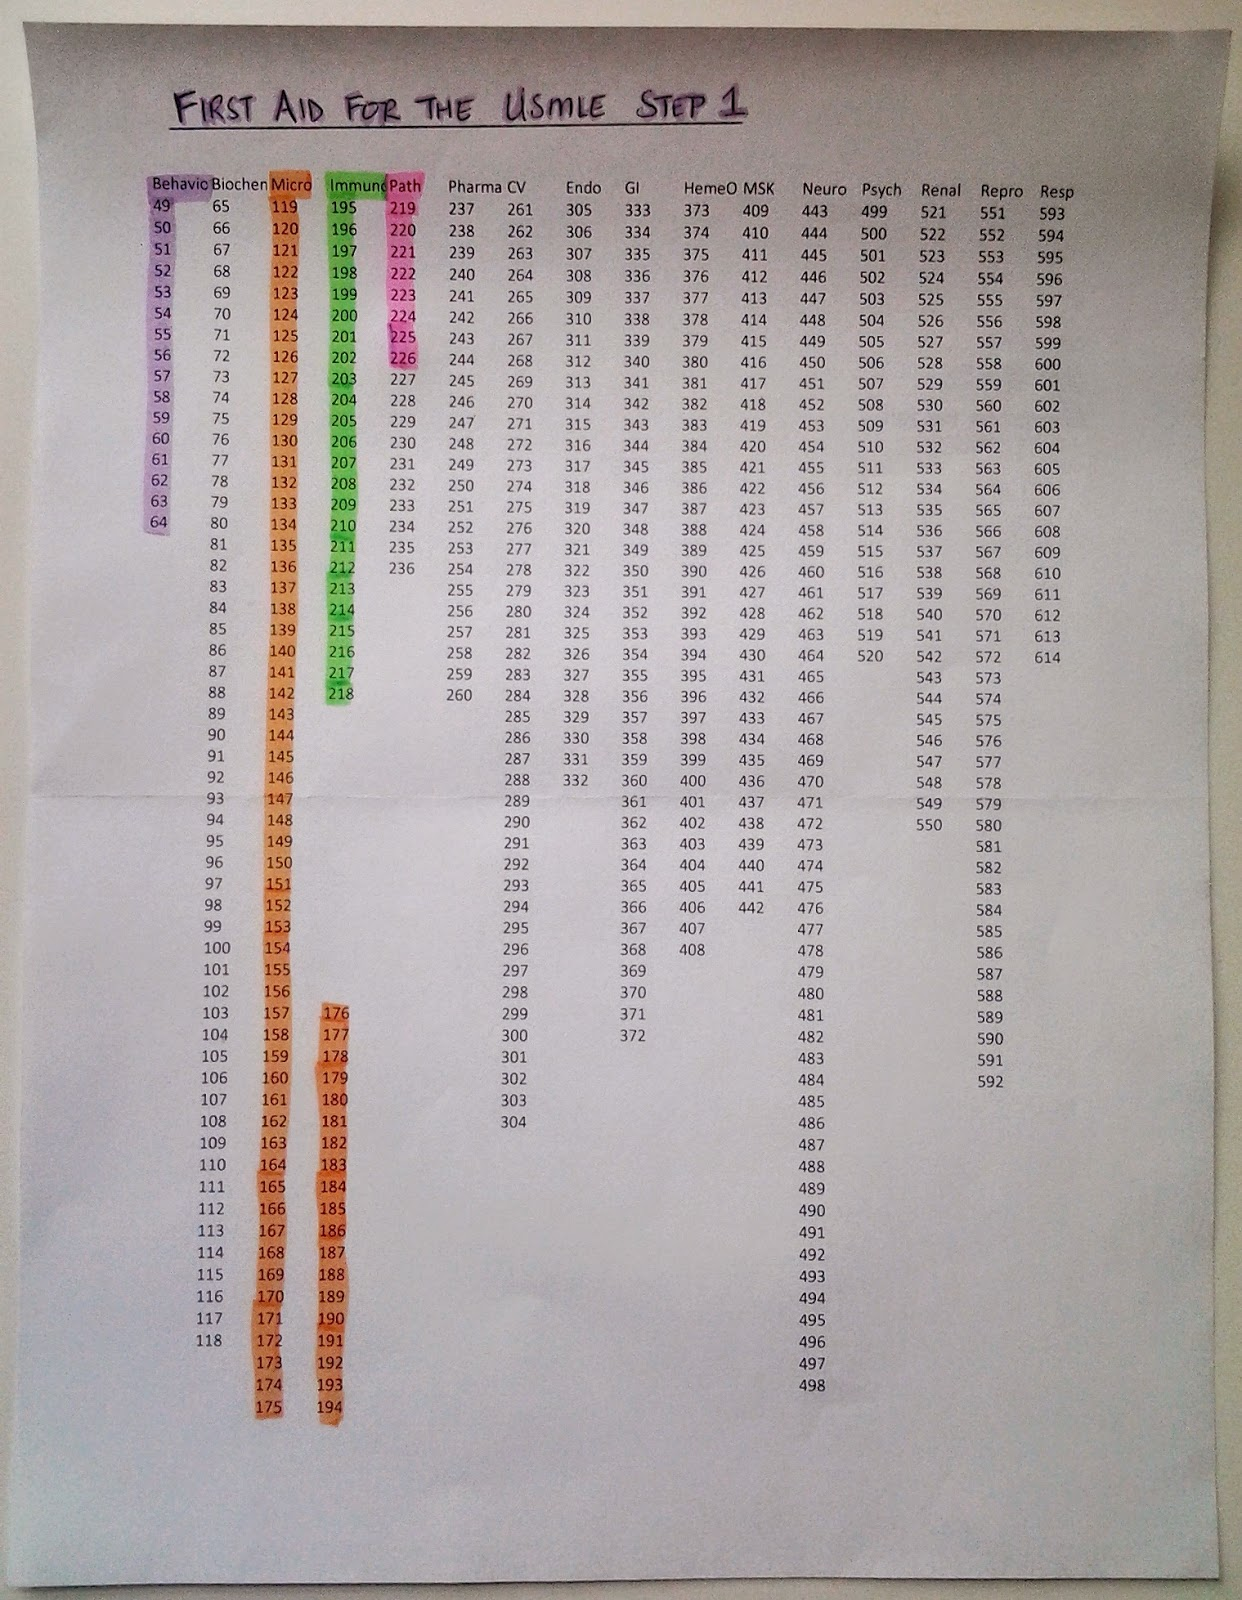 usmle step 1 study schedule